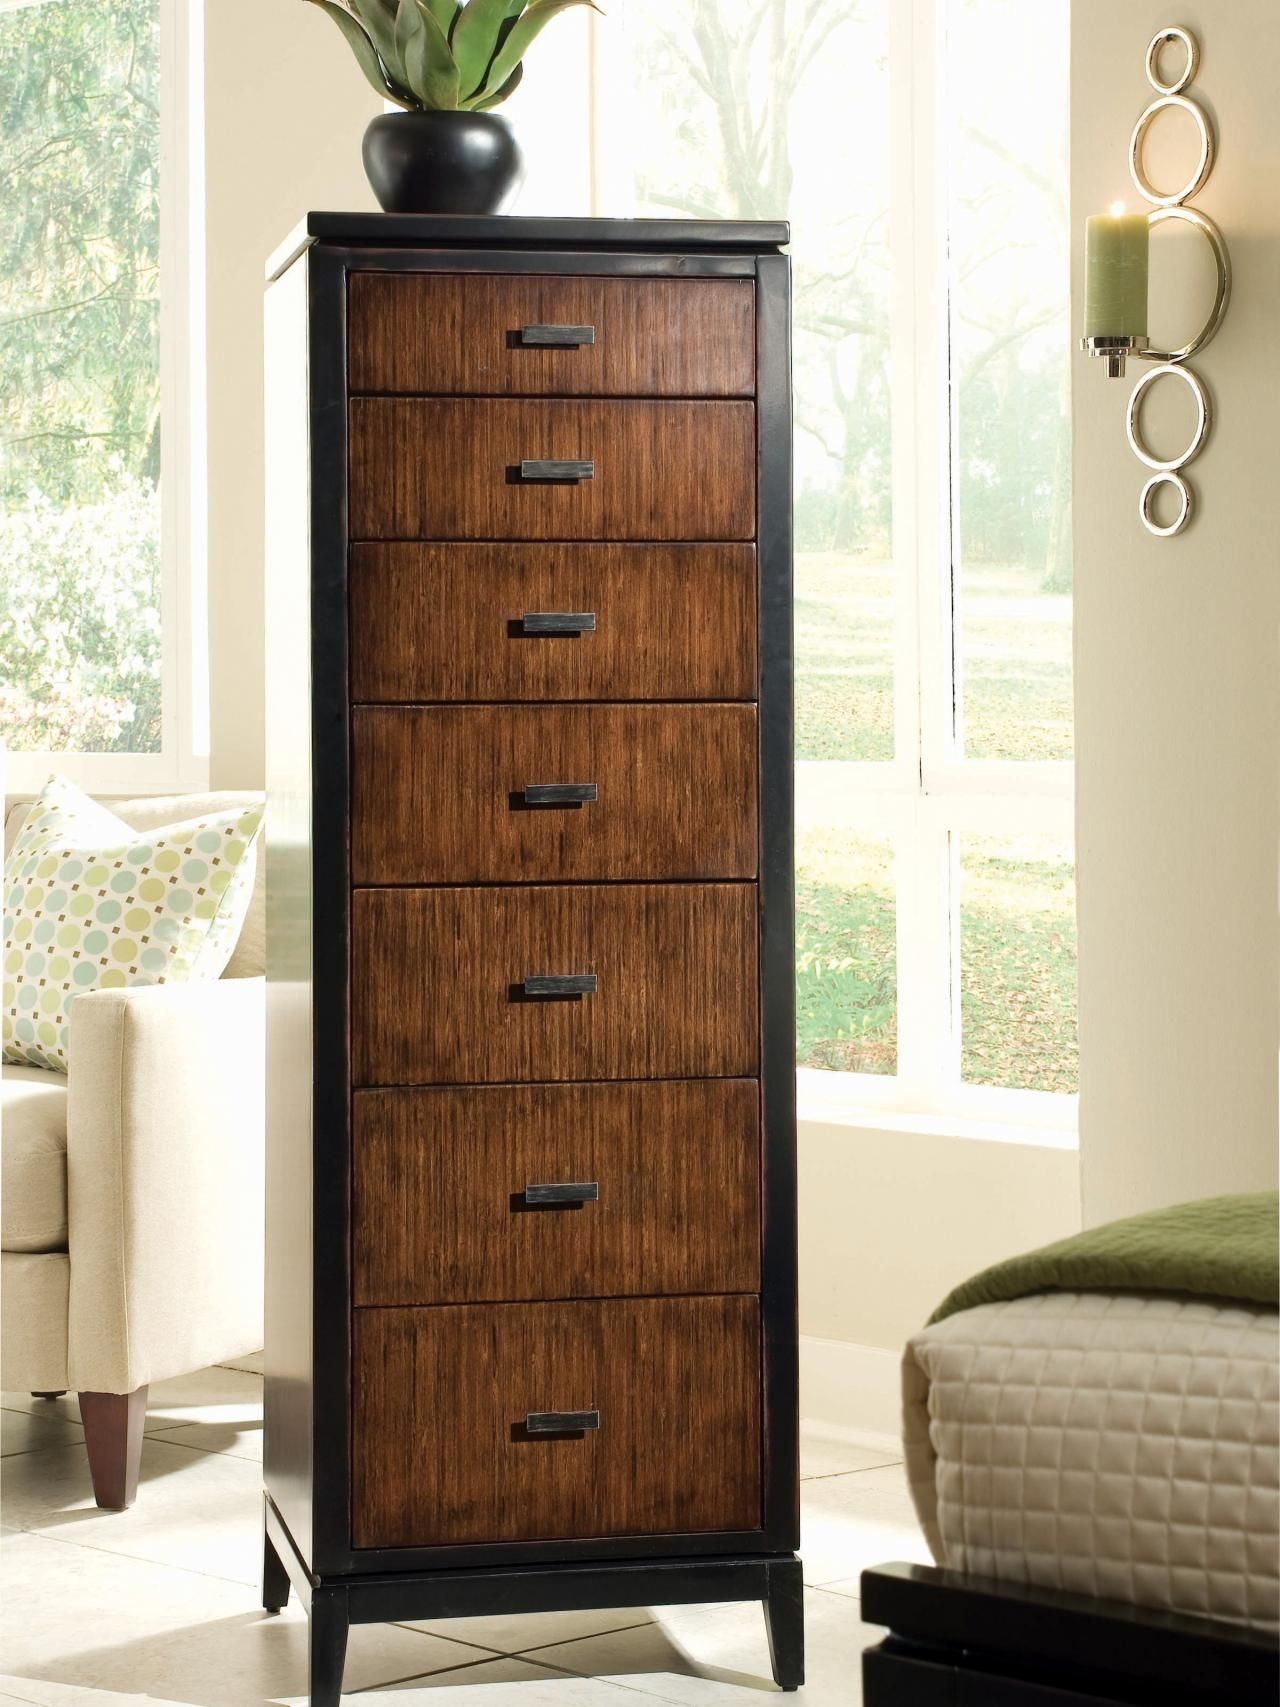 Wood Furniture Storage [ 1707 x 1280 Pixel ]